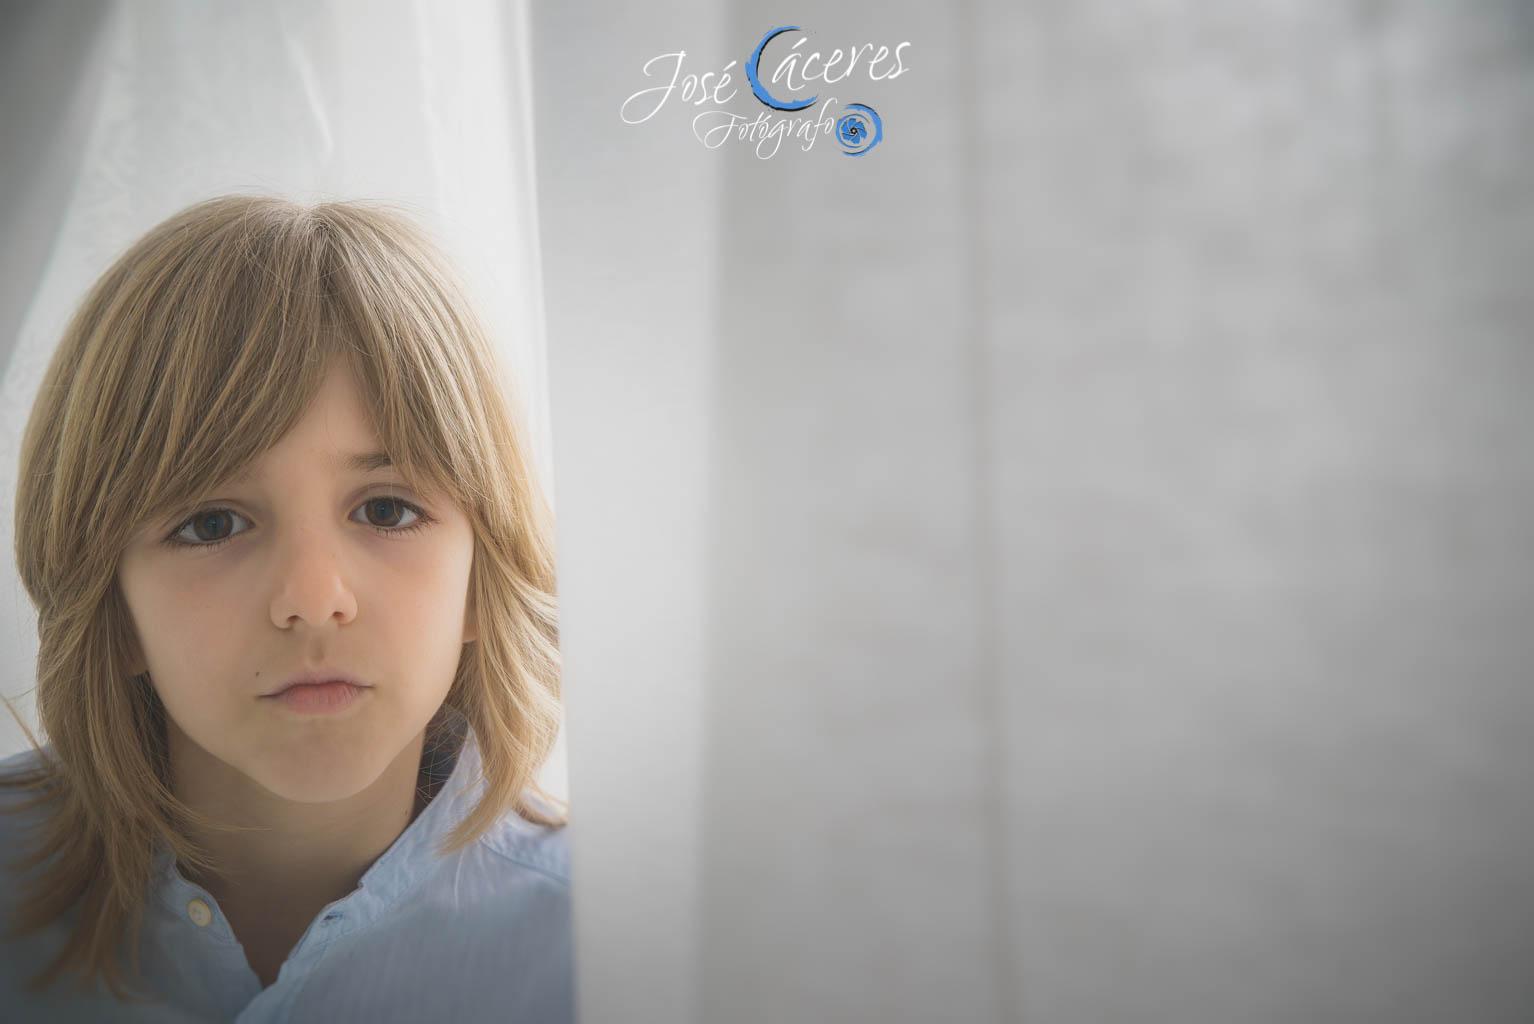 Jose Caceres Fotografia, Sesion Estudio Fotografia Niños-1